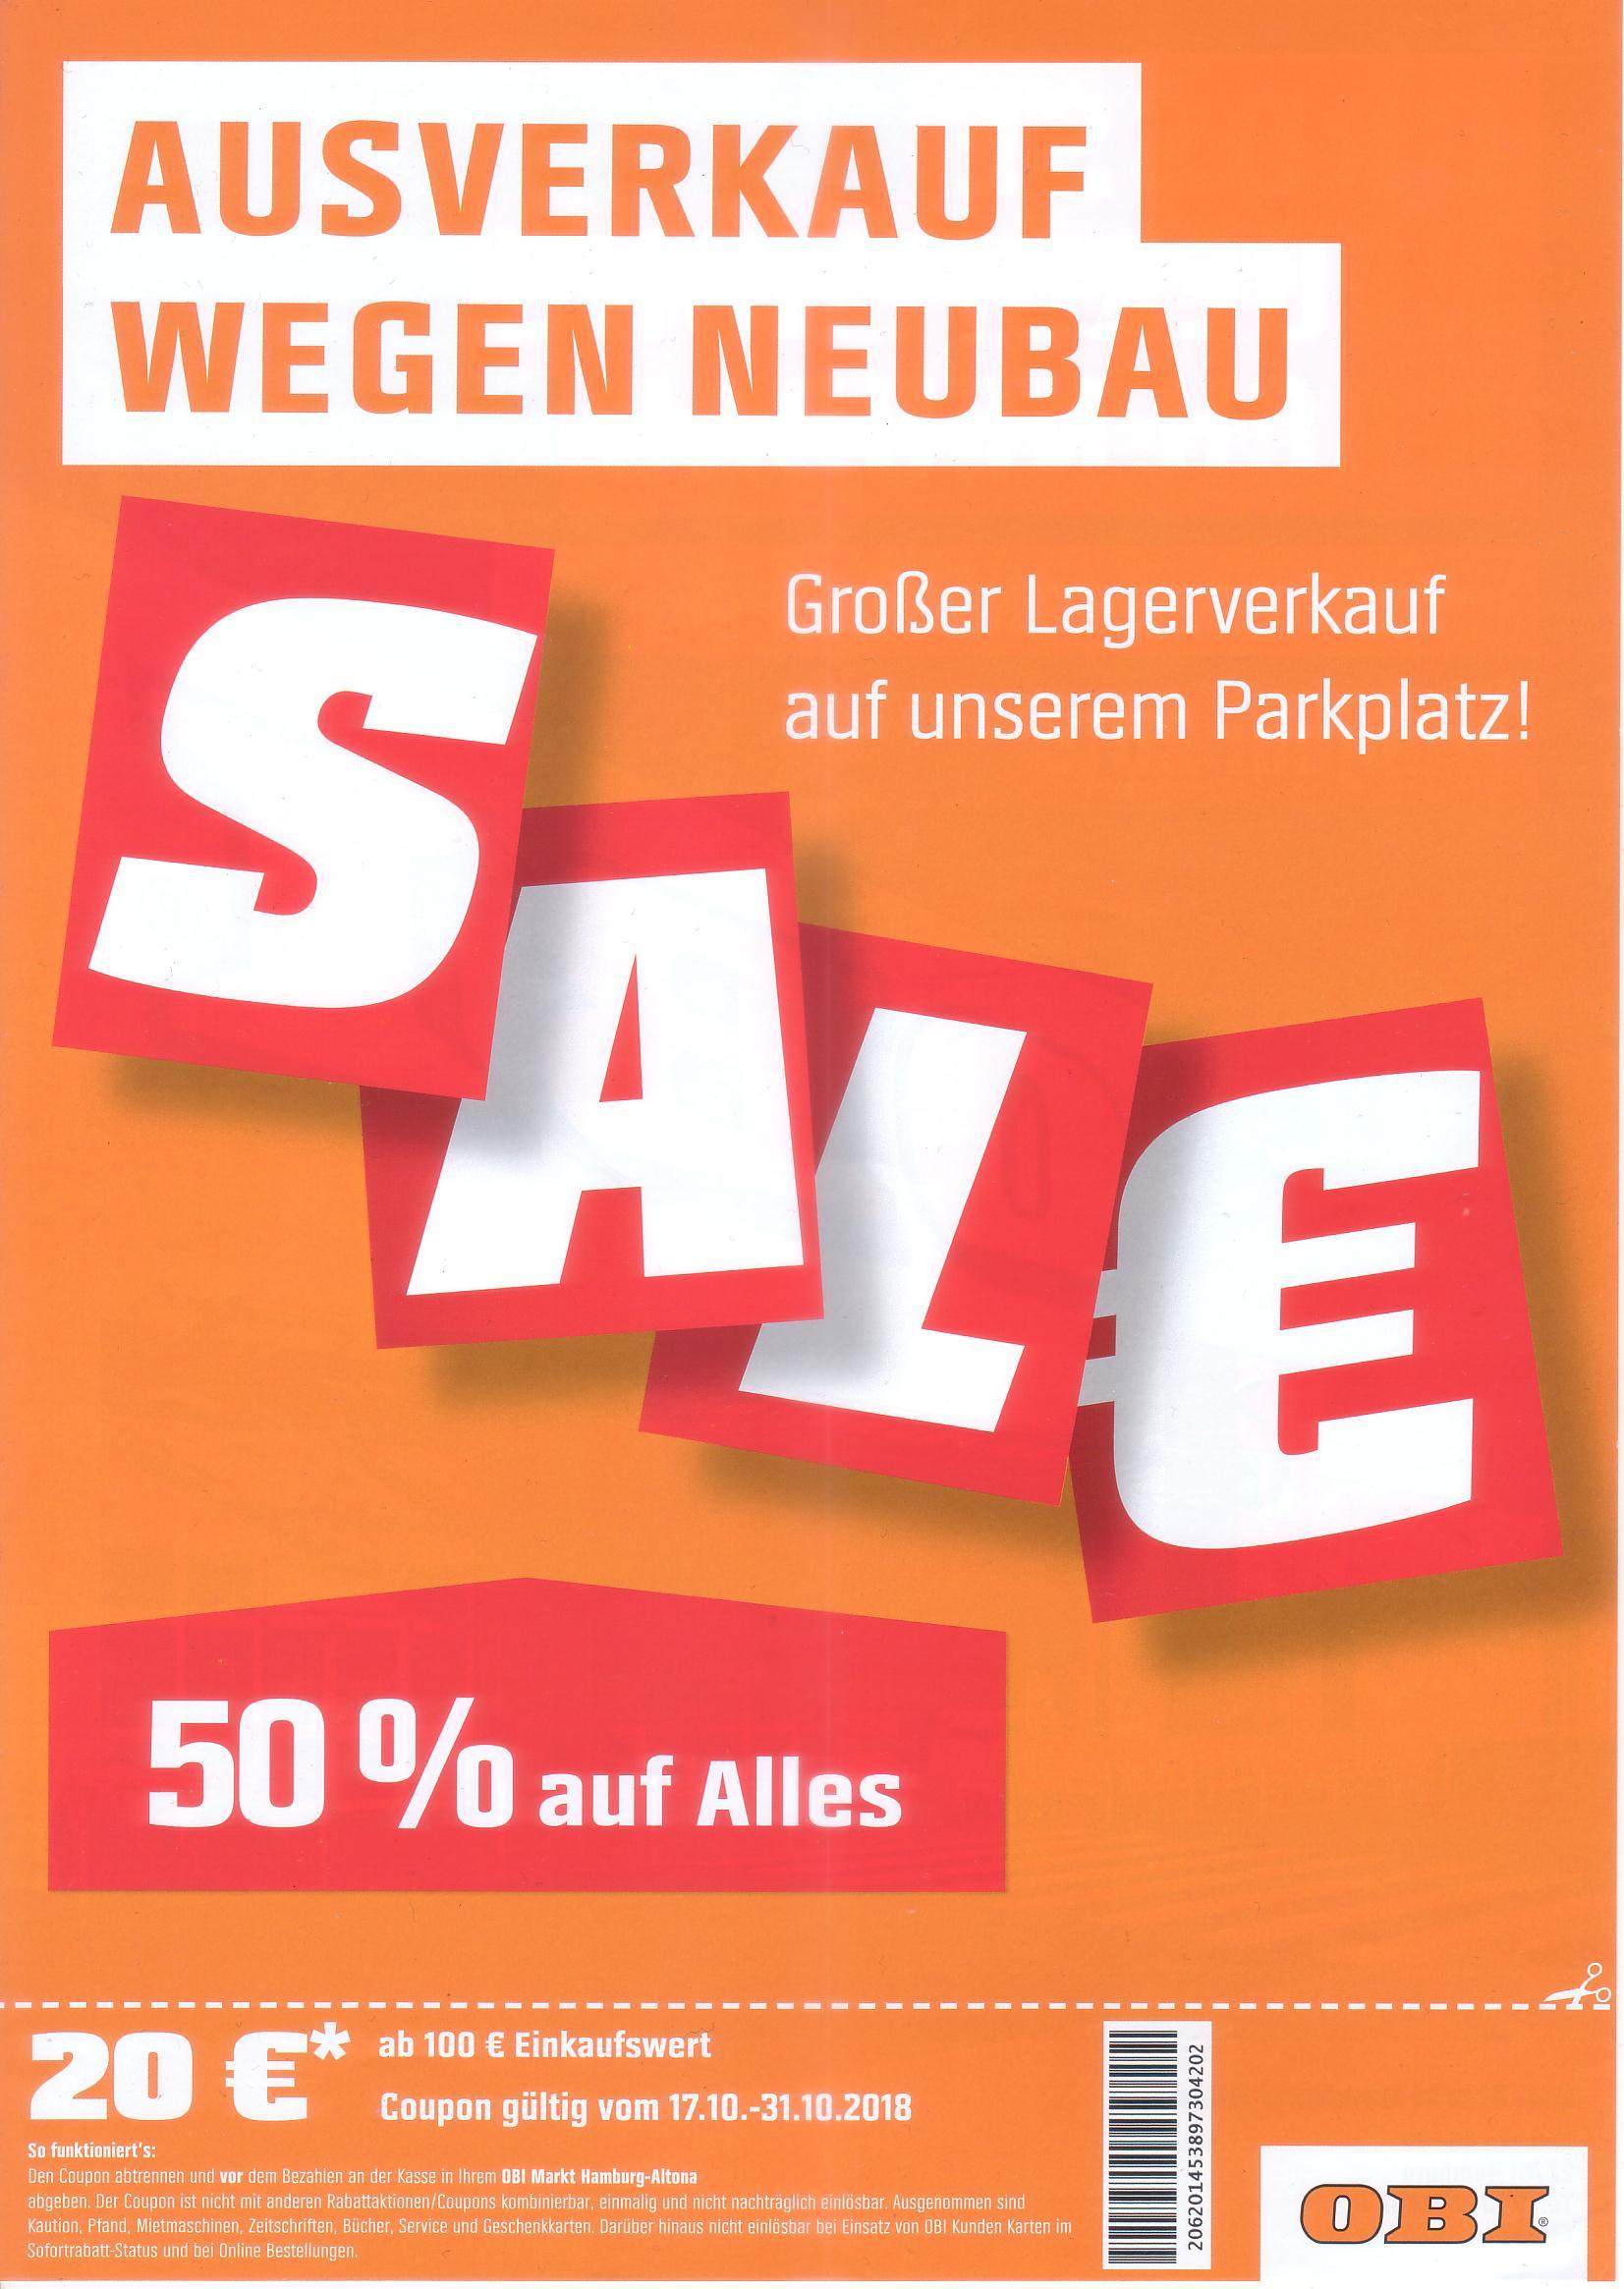 [LOKAL Hamburg] OBI, wegen Neubau -50% auf Alles im Parkplatzverkauf + Coupon 100mbw-20eu